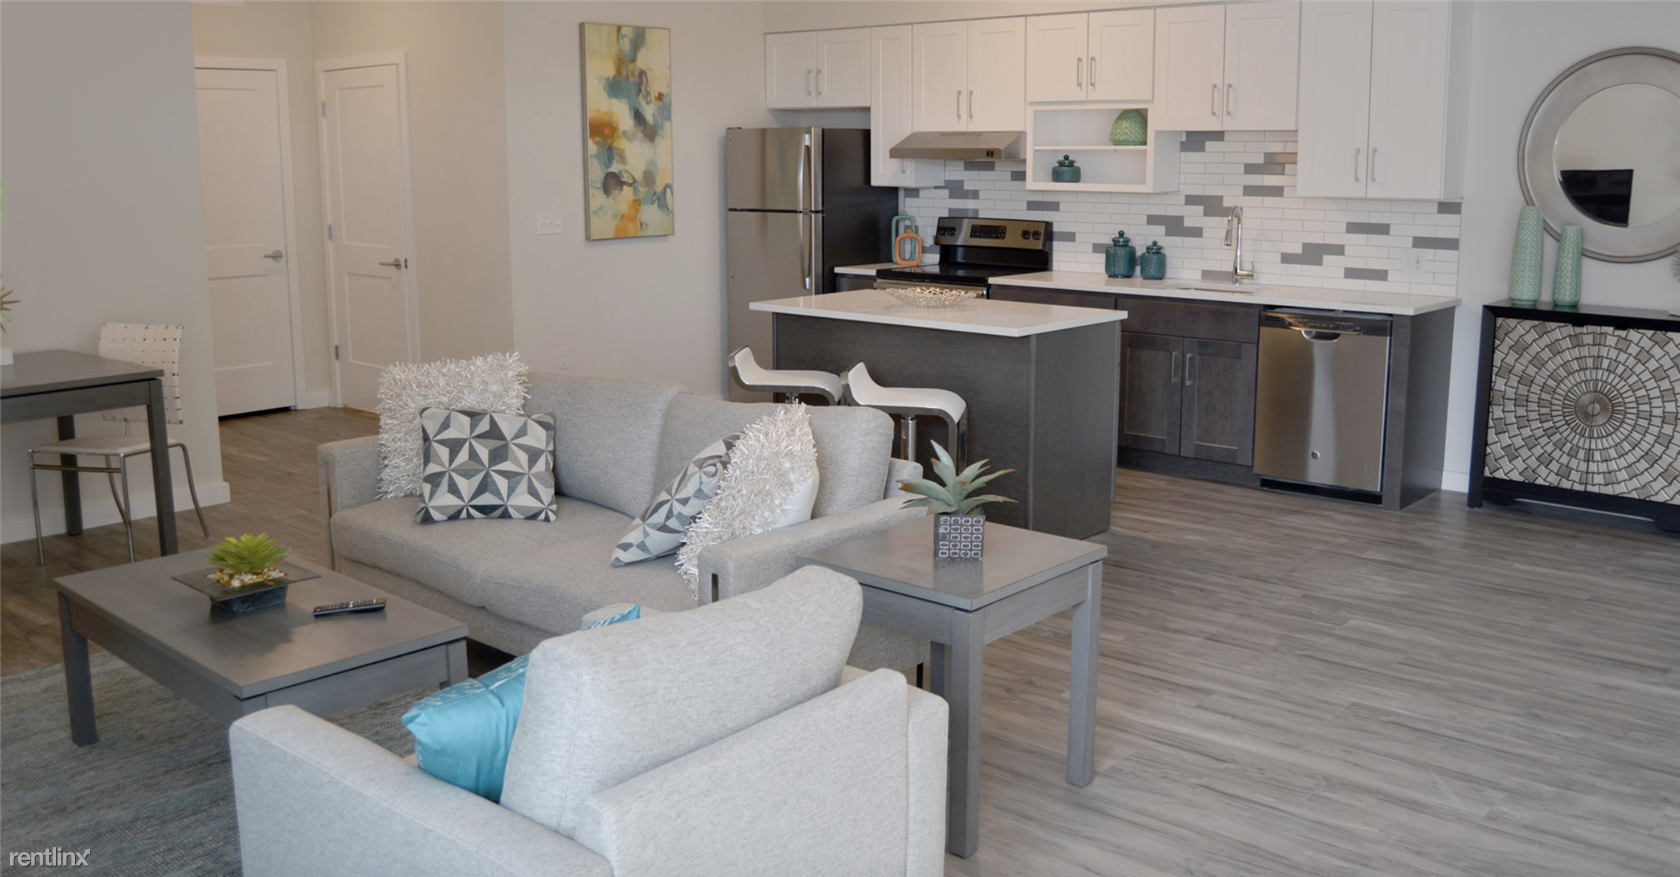 Rental Properties In Providence Ri 13 Rentals Rentalads